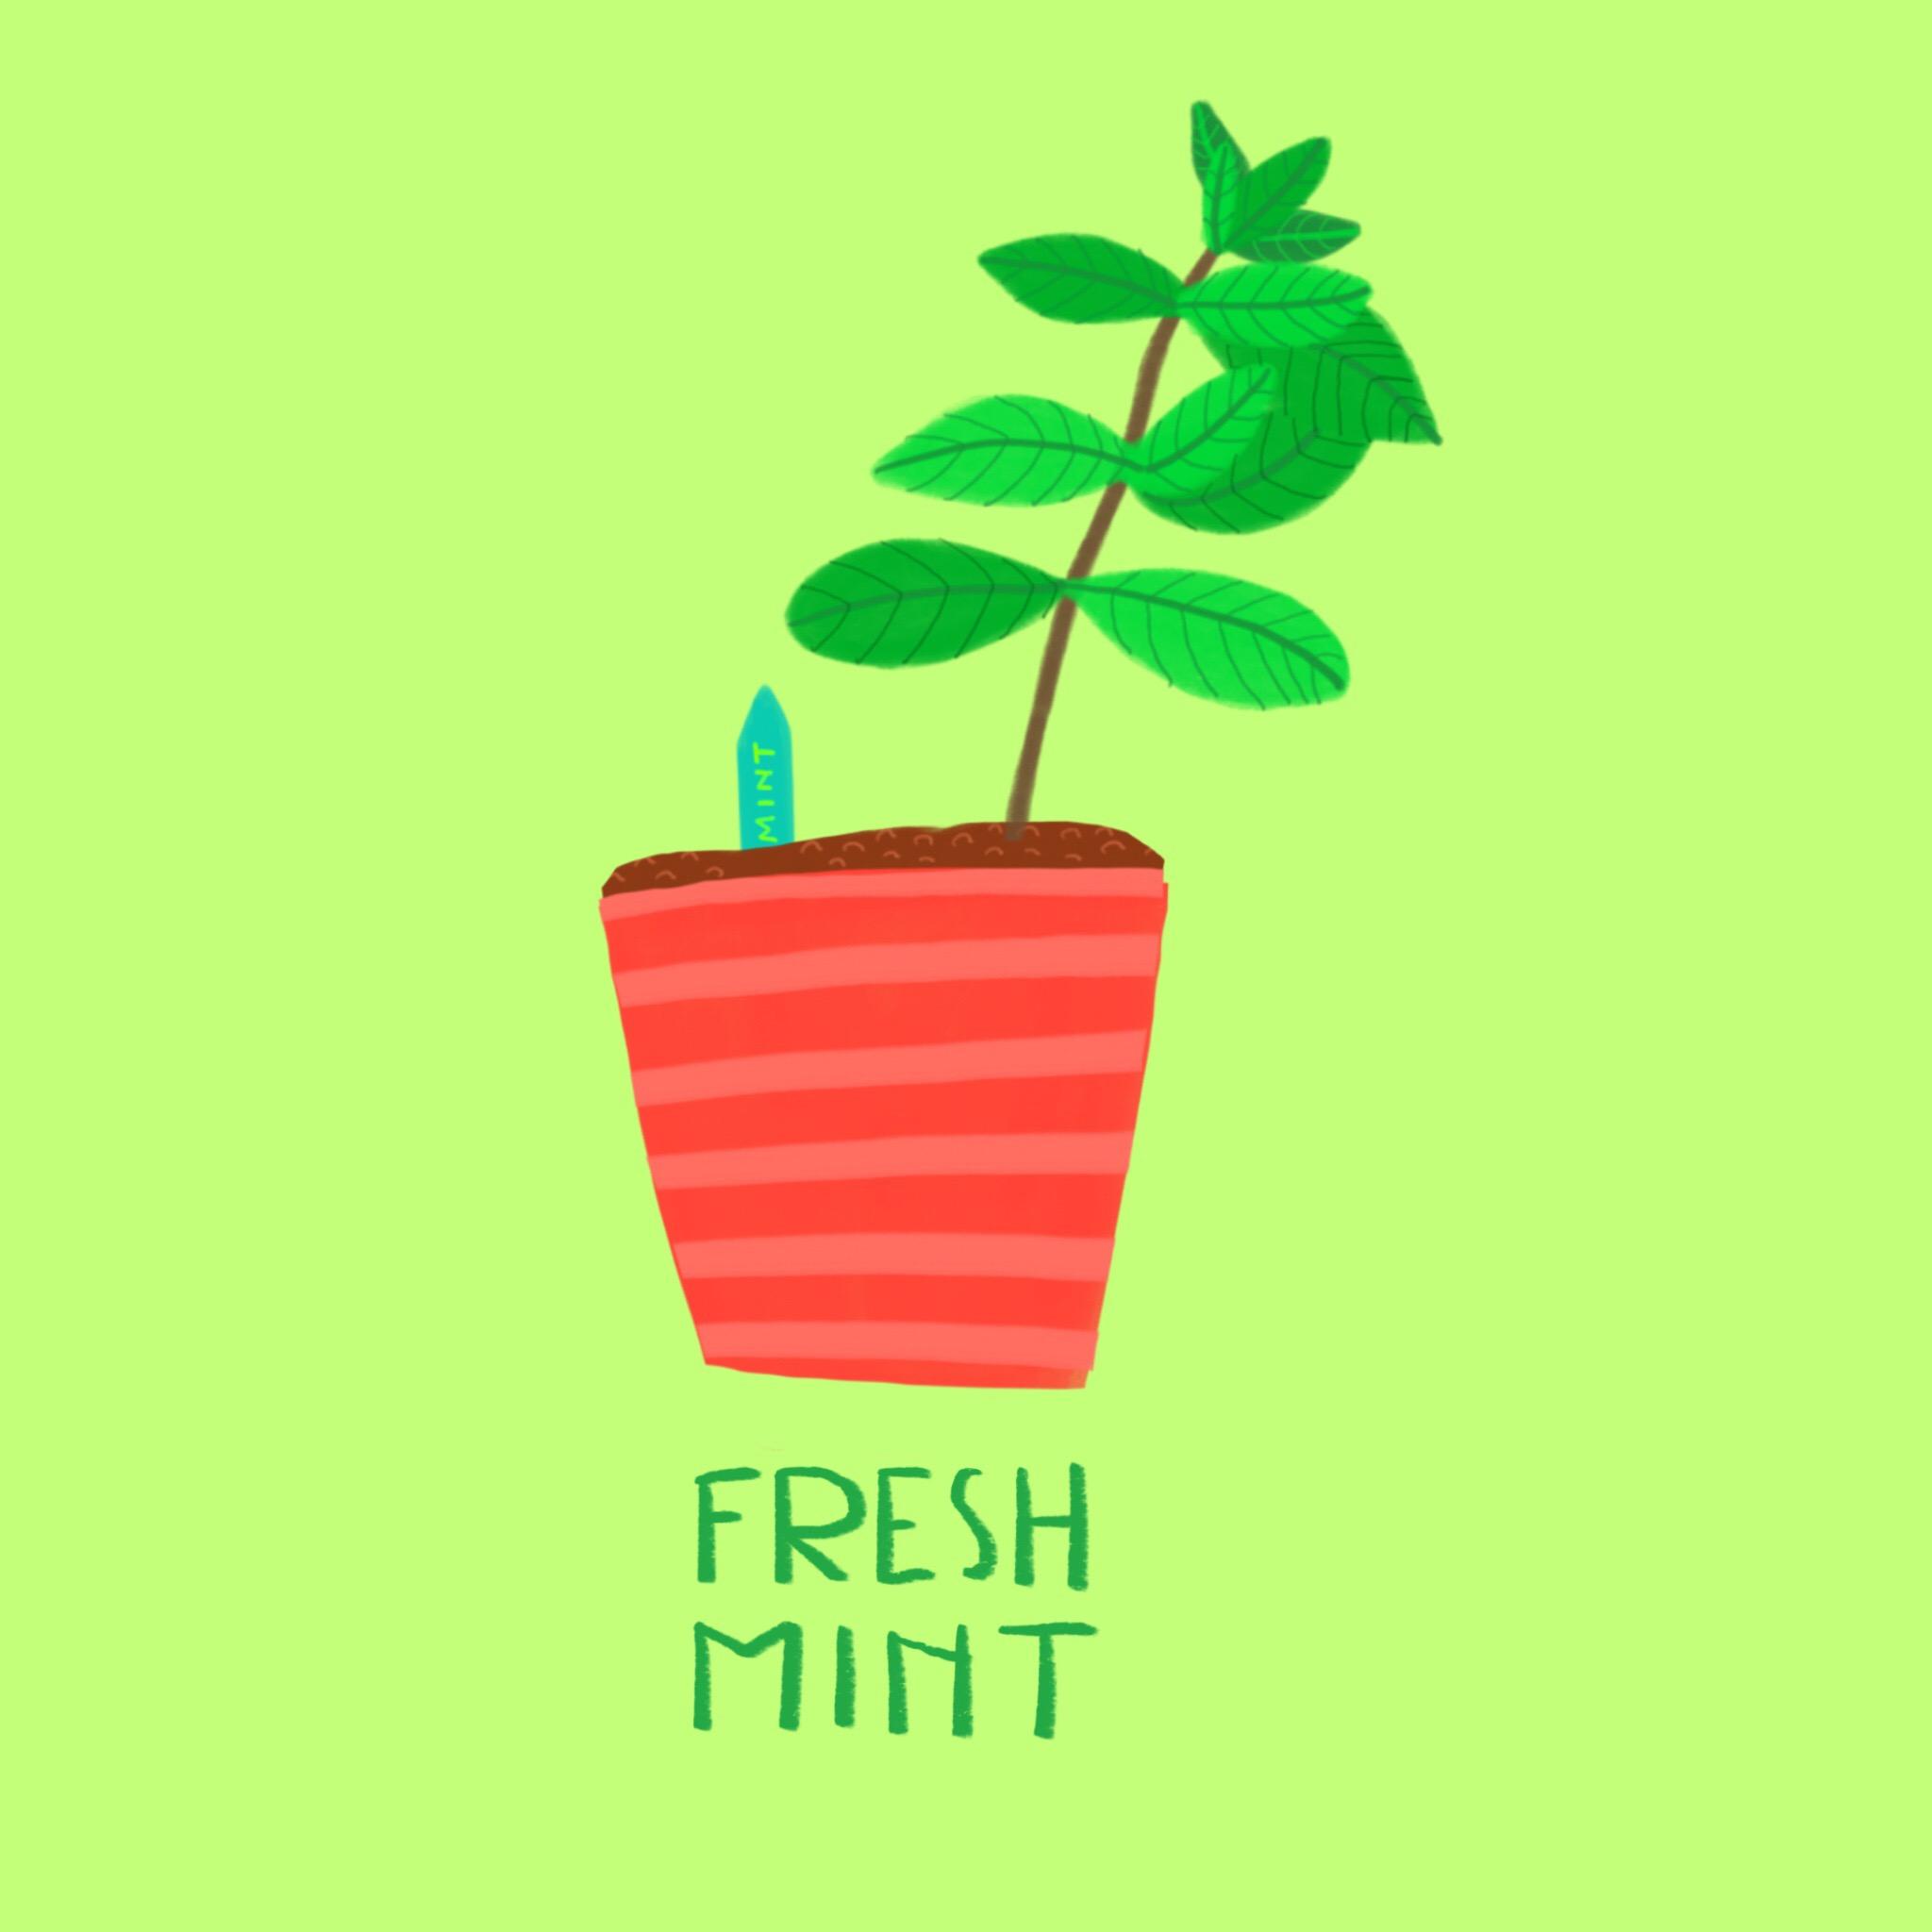 82_-_Mint_.jpg